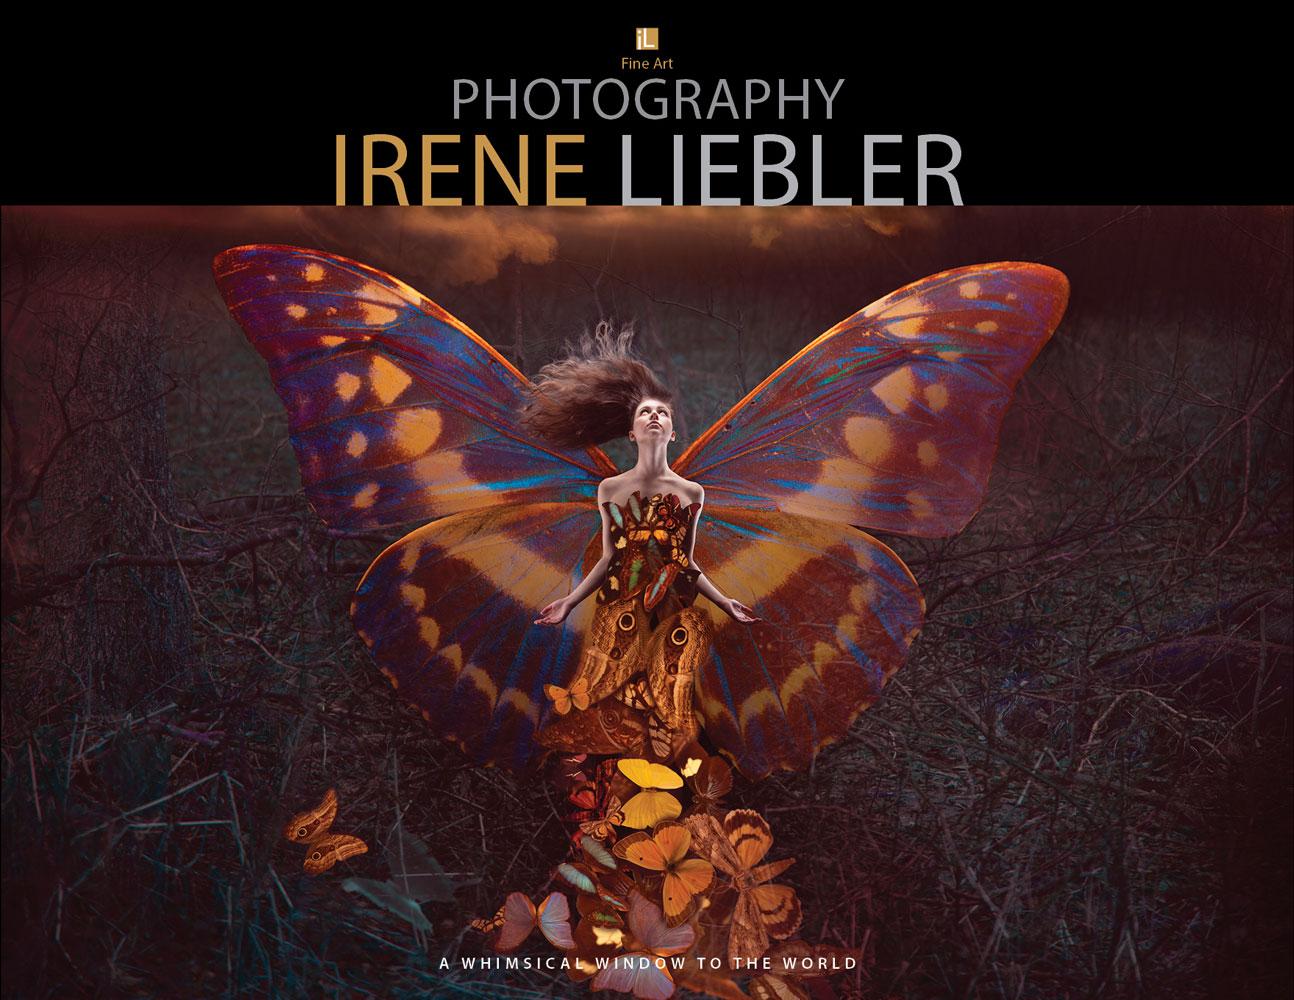 rene-Liebler-Portfolio-2014.pdf